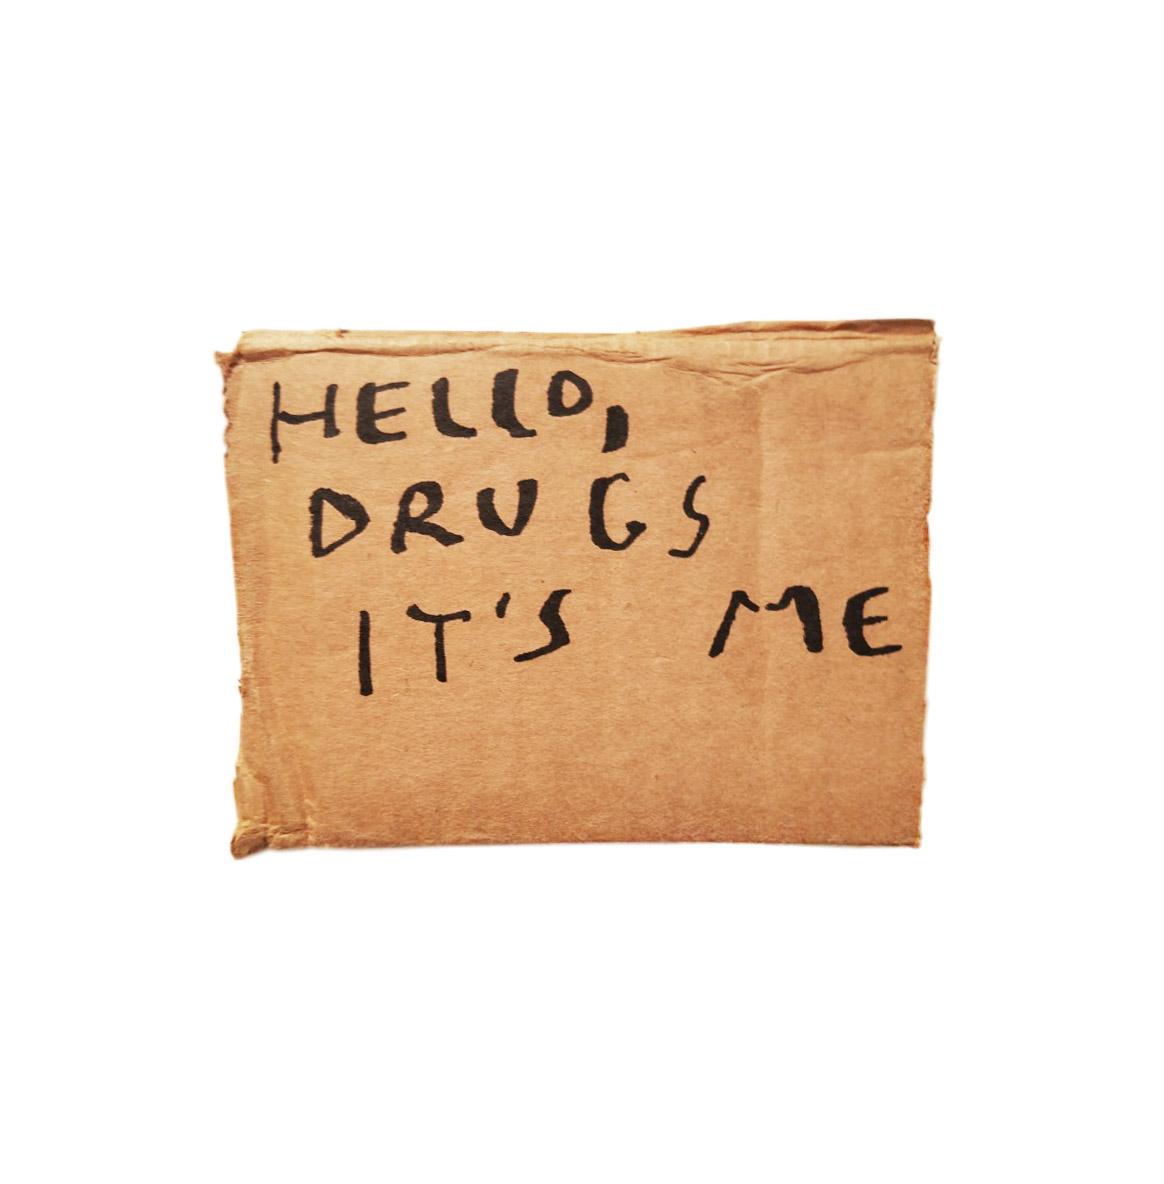 Hale_James_Hello_Drugs.jpg